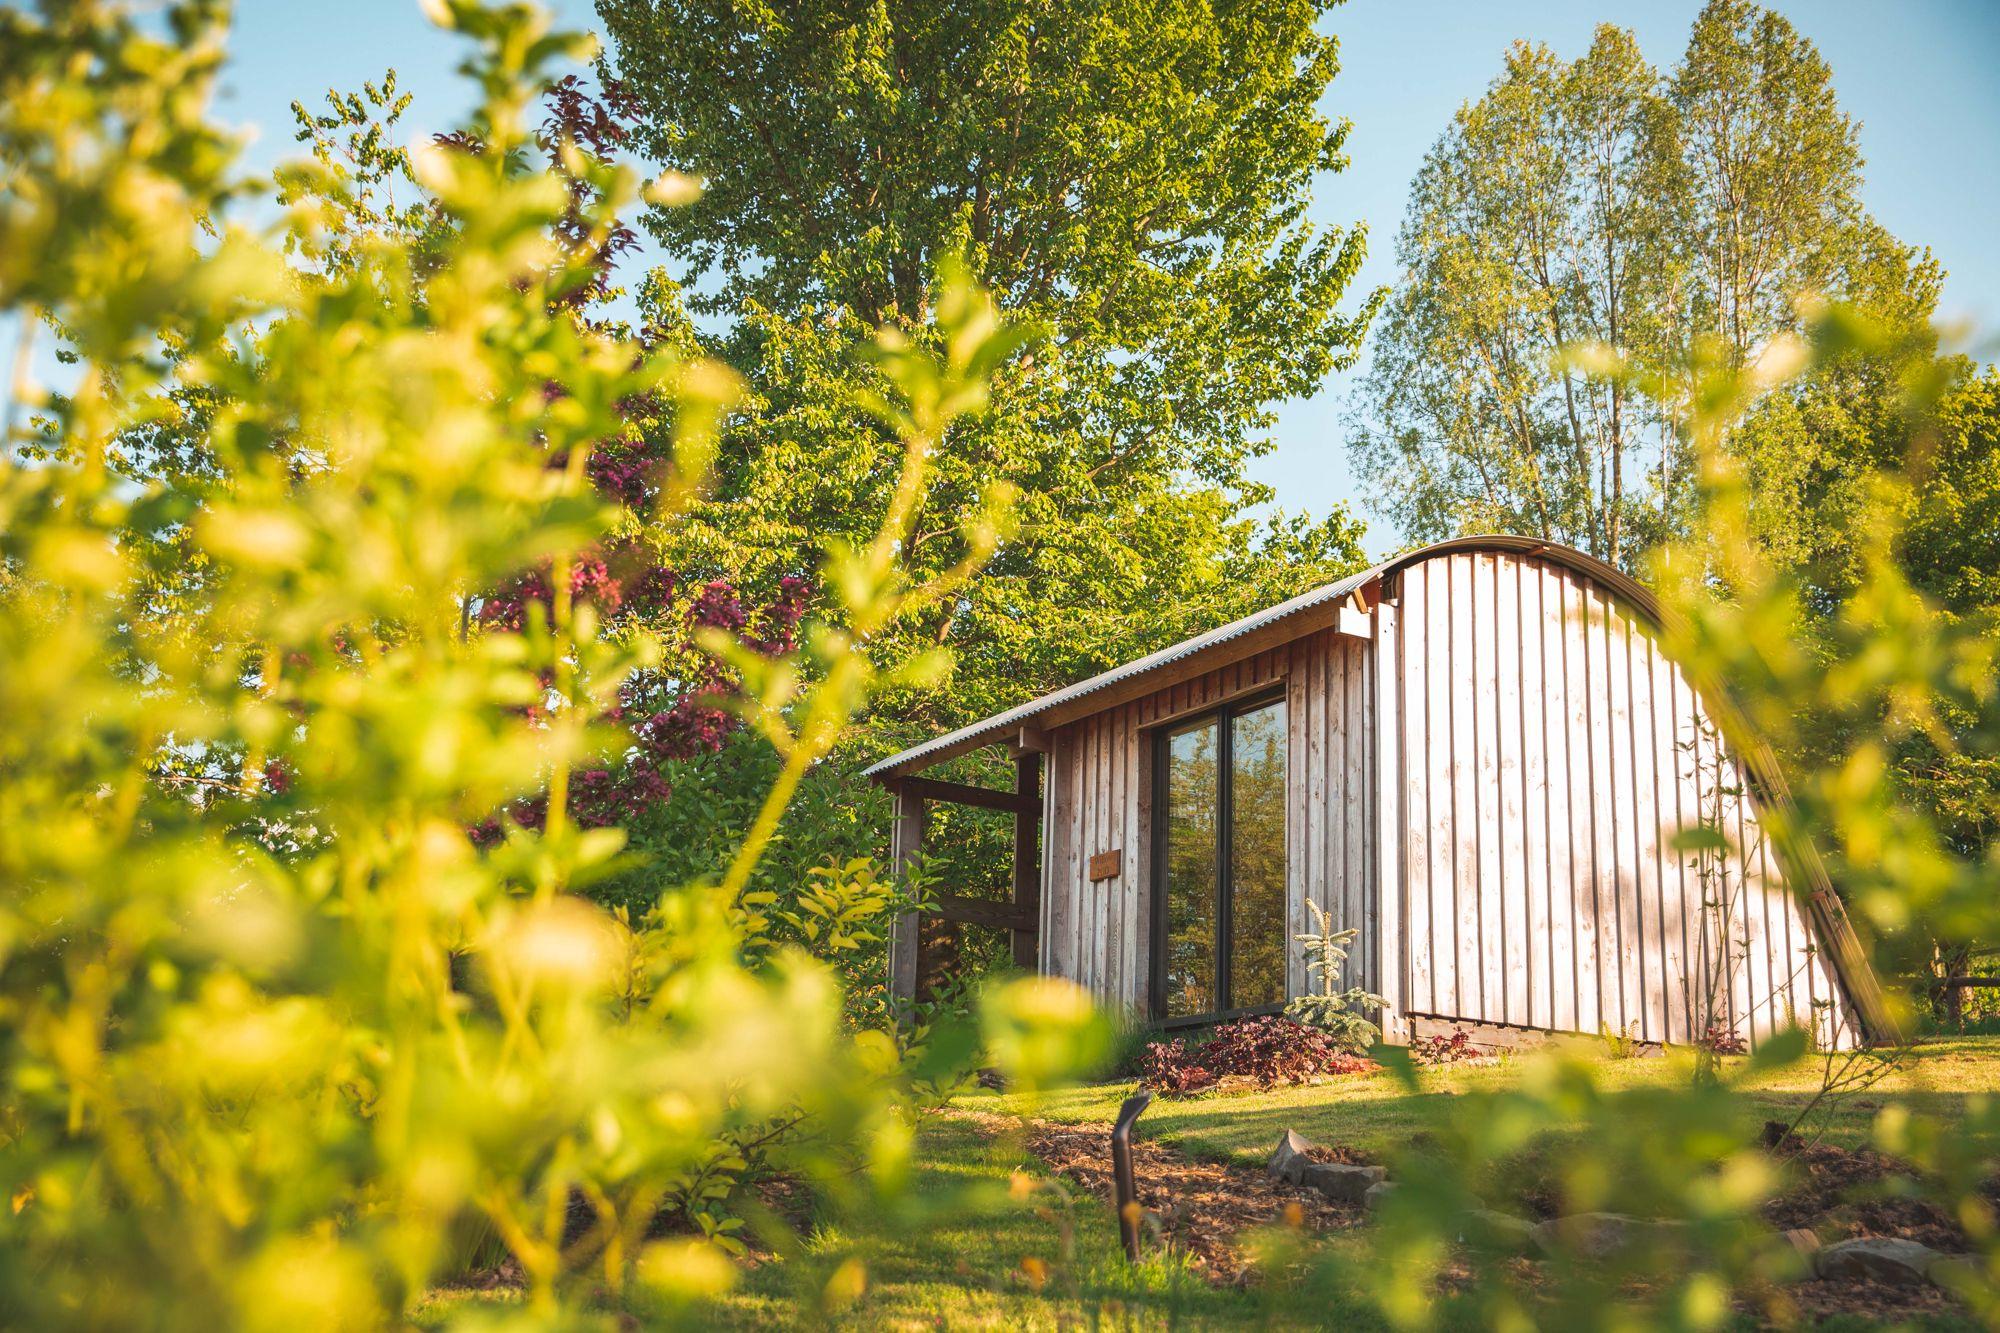 Glamping in Knighton – Cool Camping